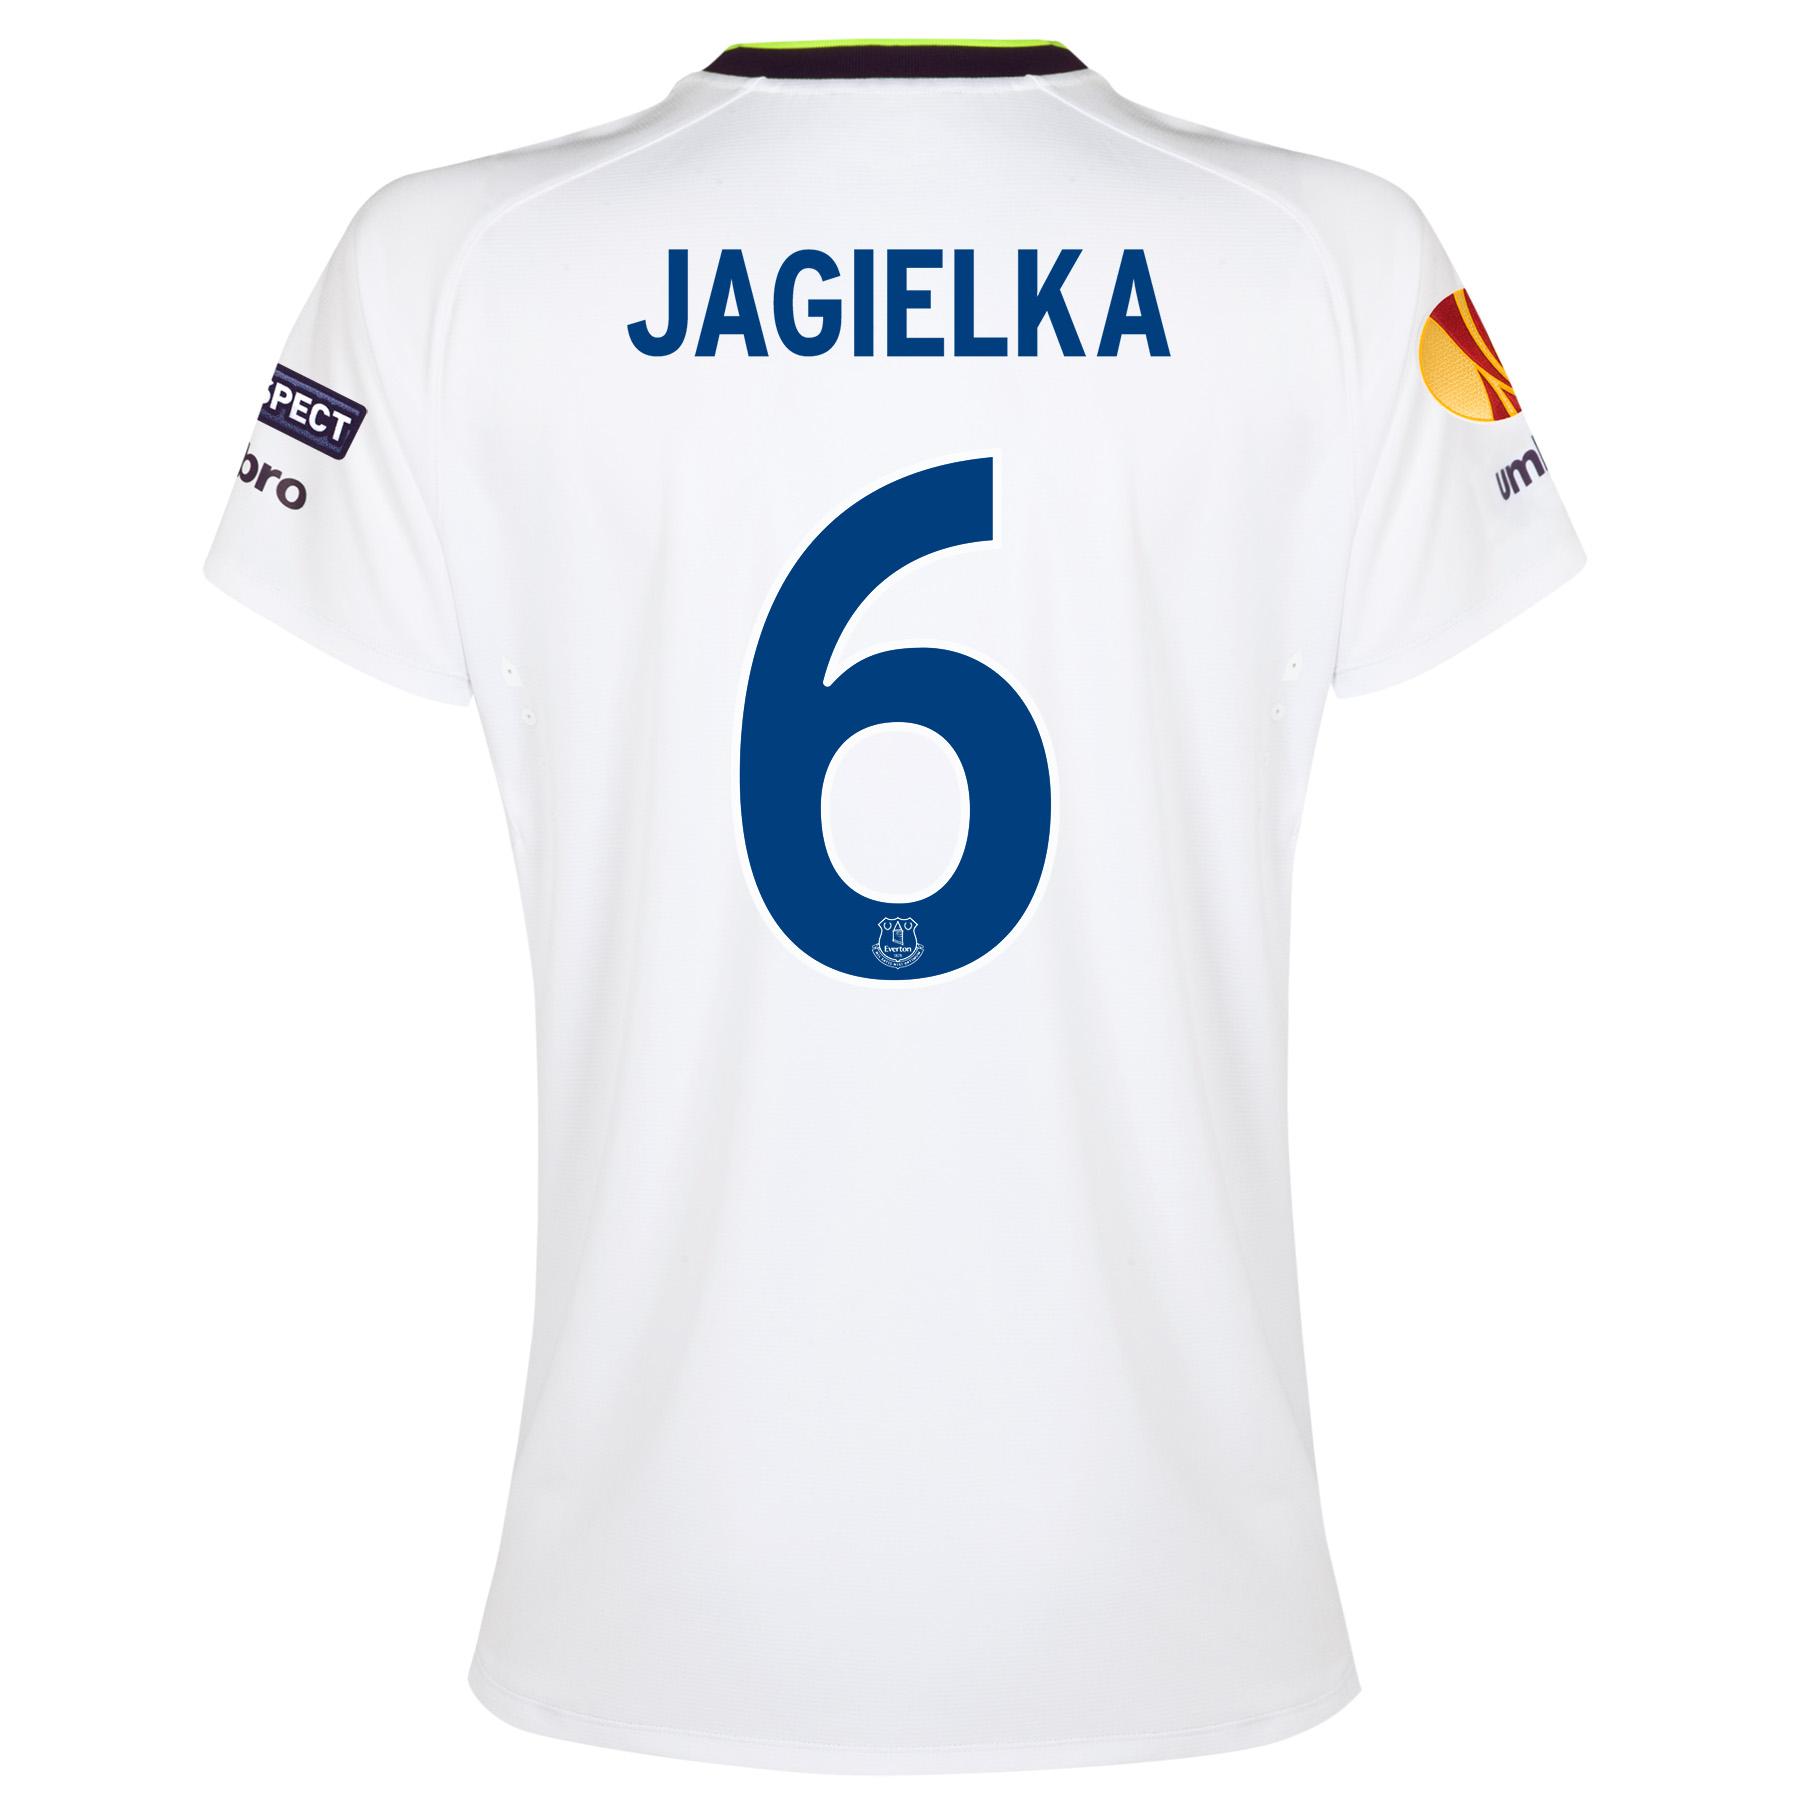 Everton UEFA Europa League 3rd Shirt 2014/15 - Womens with Jagielka 6